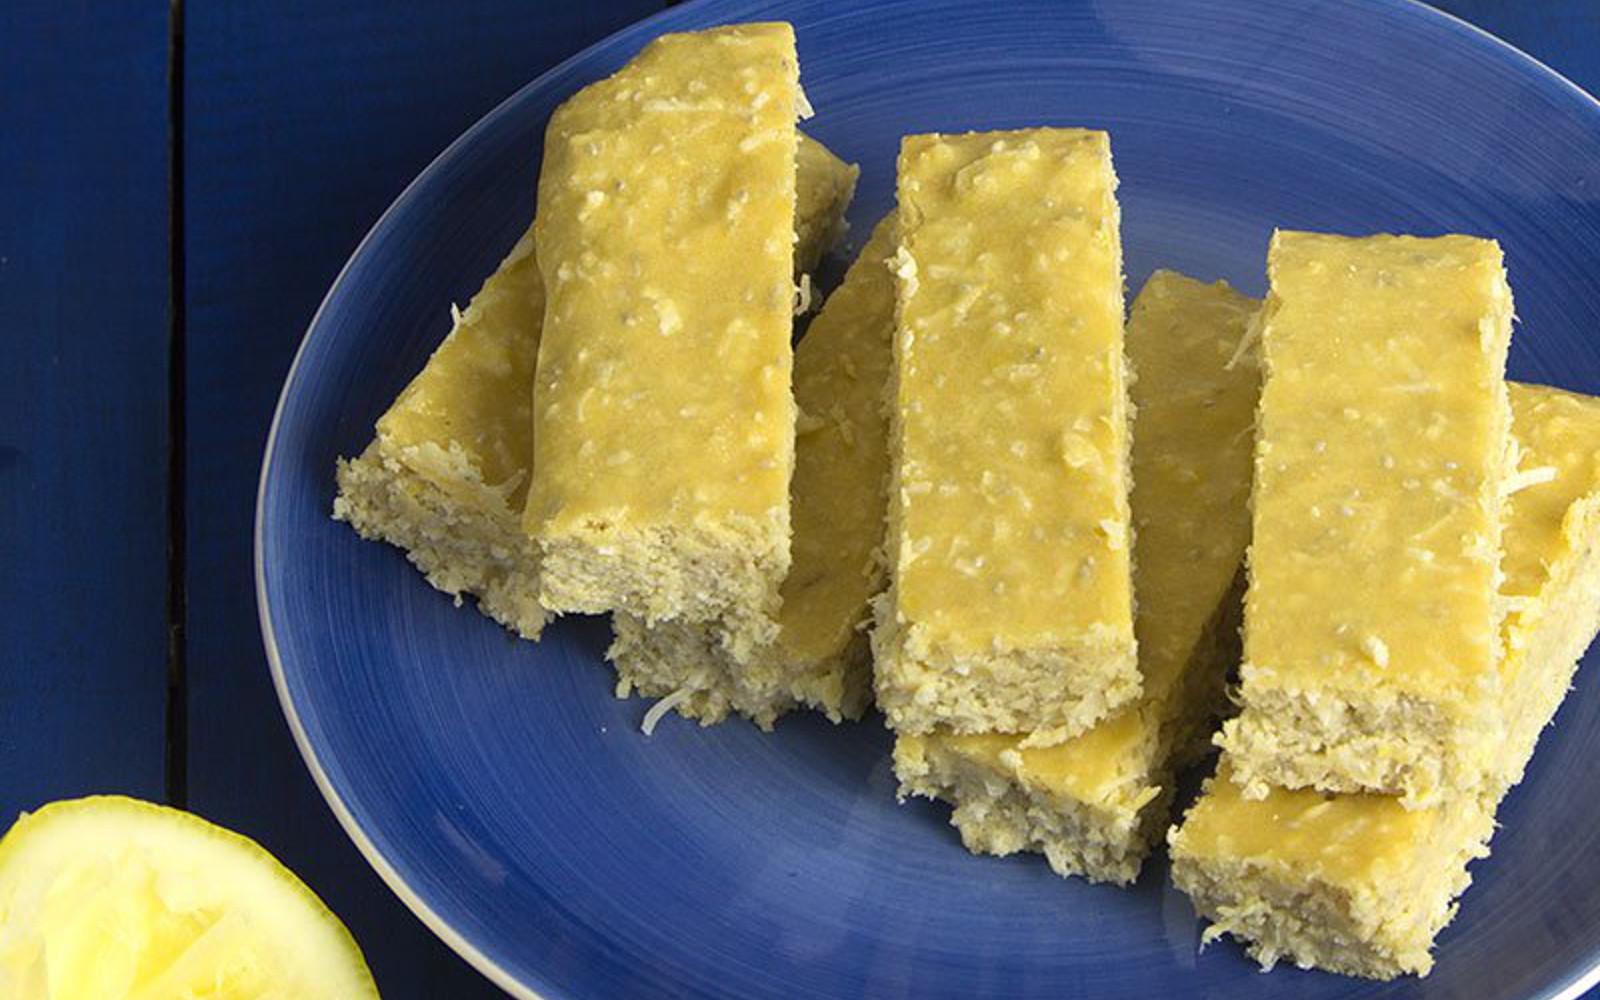 Lemon Coconut Protein Bars